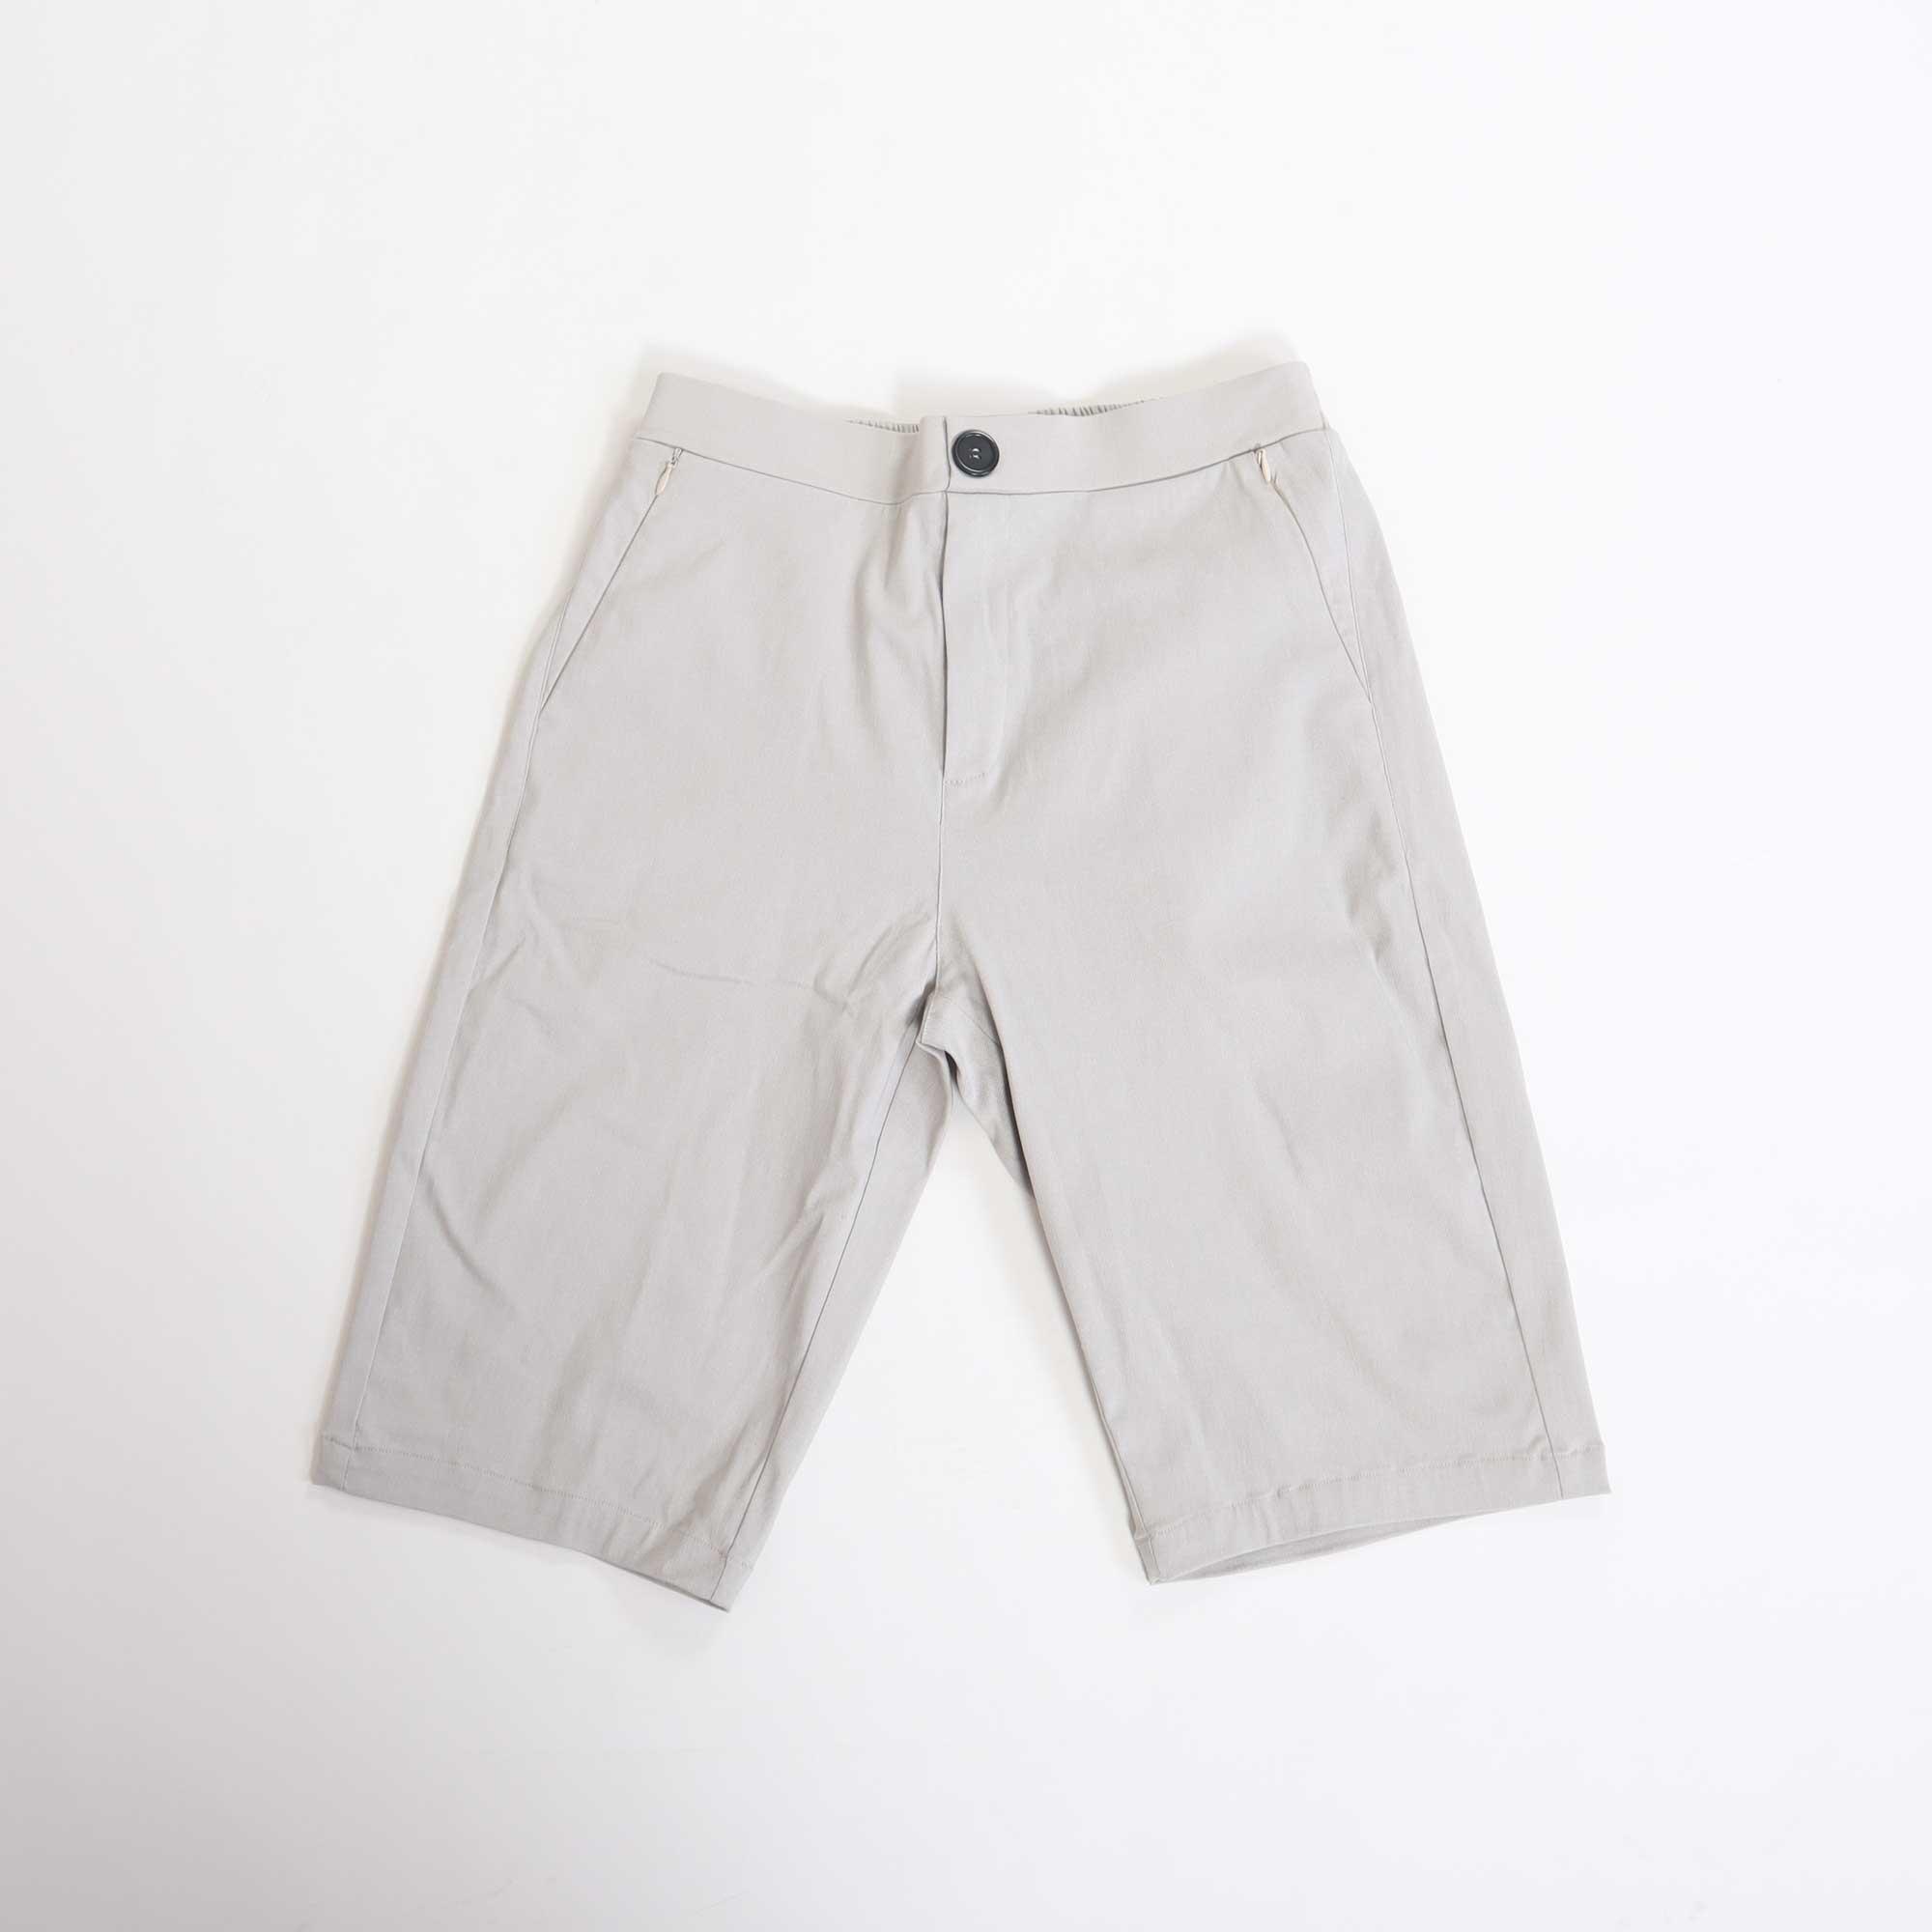 pantalon-shorts-6